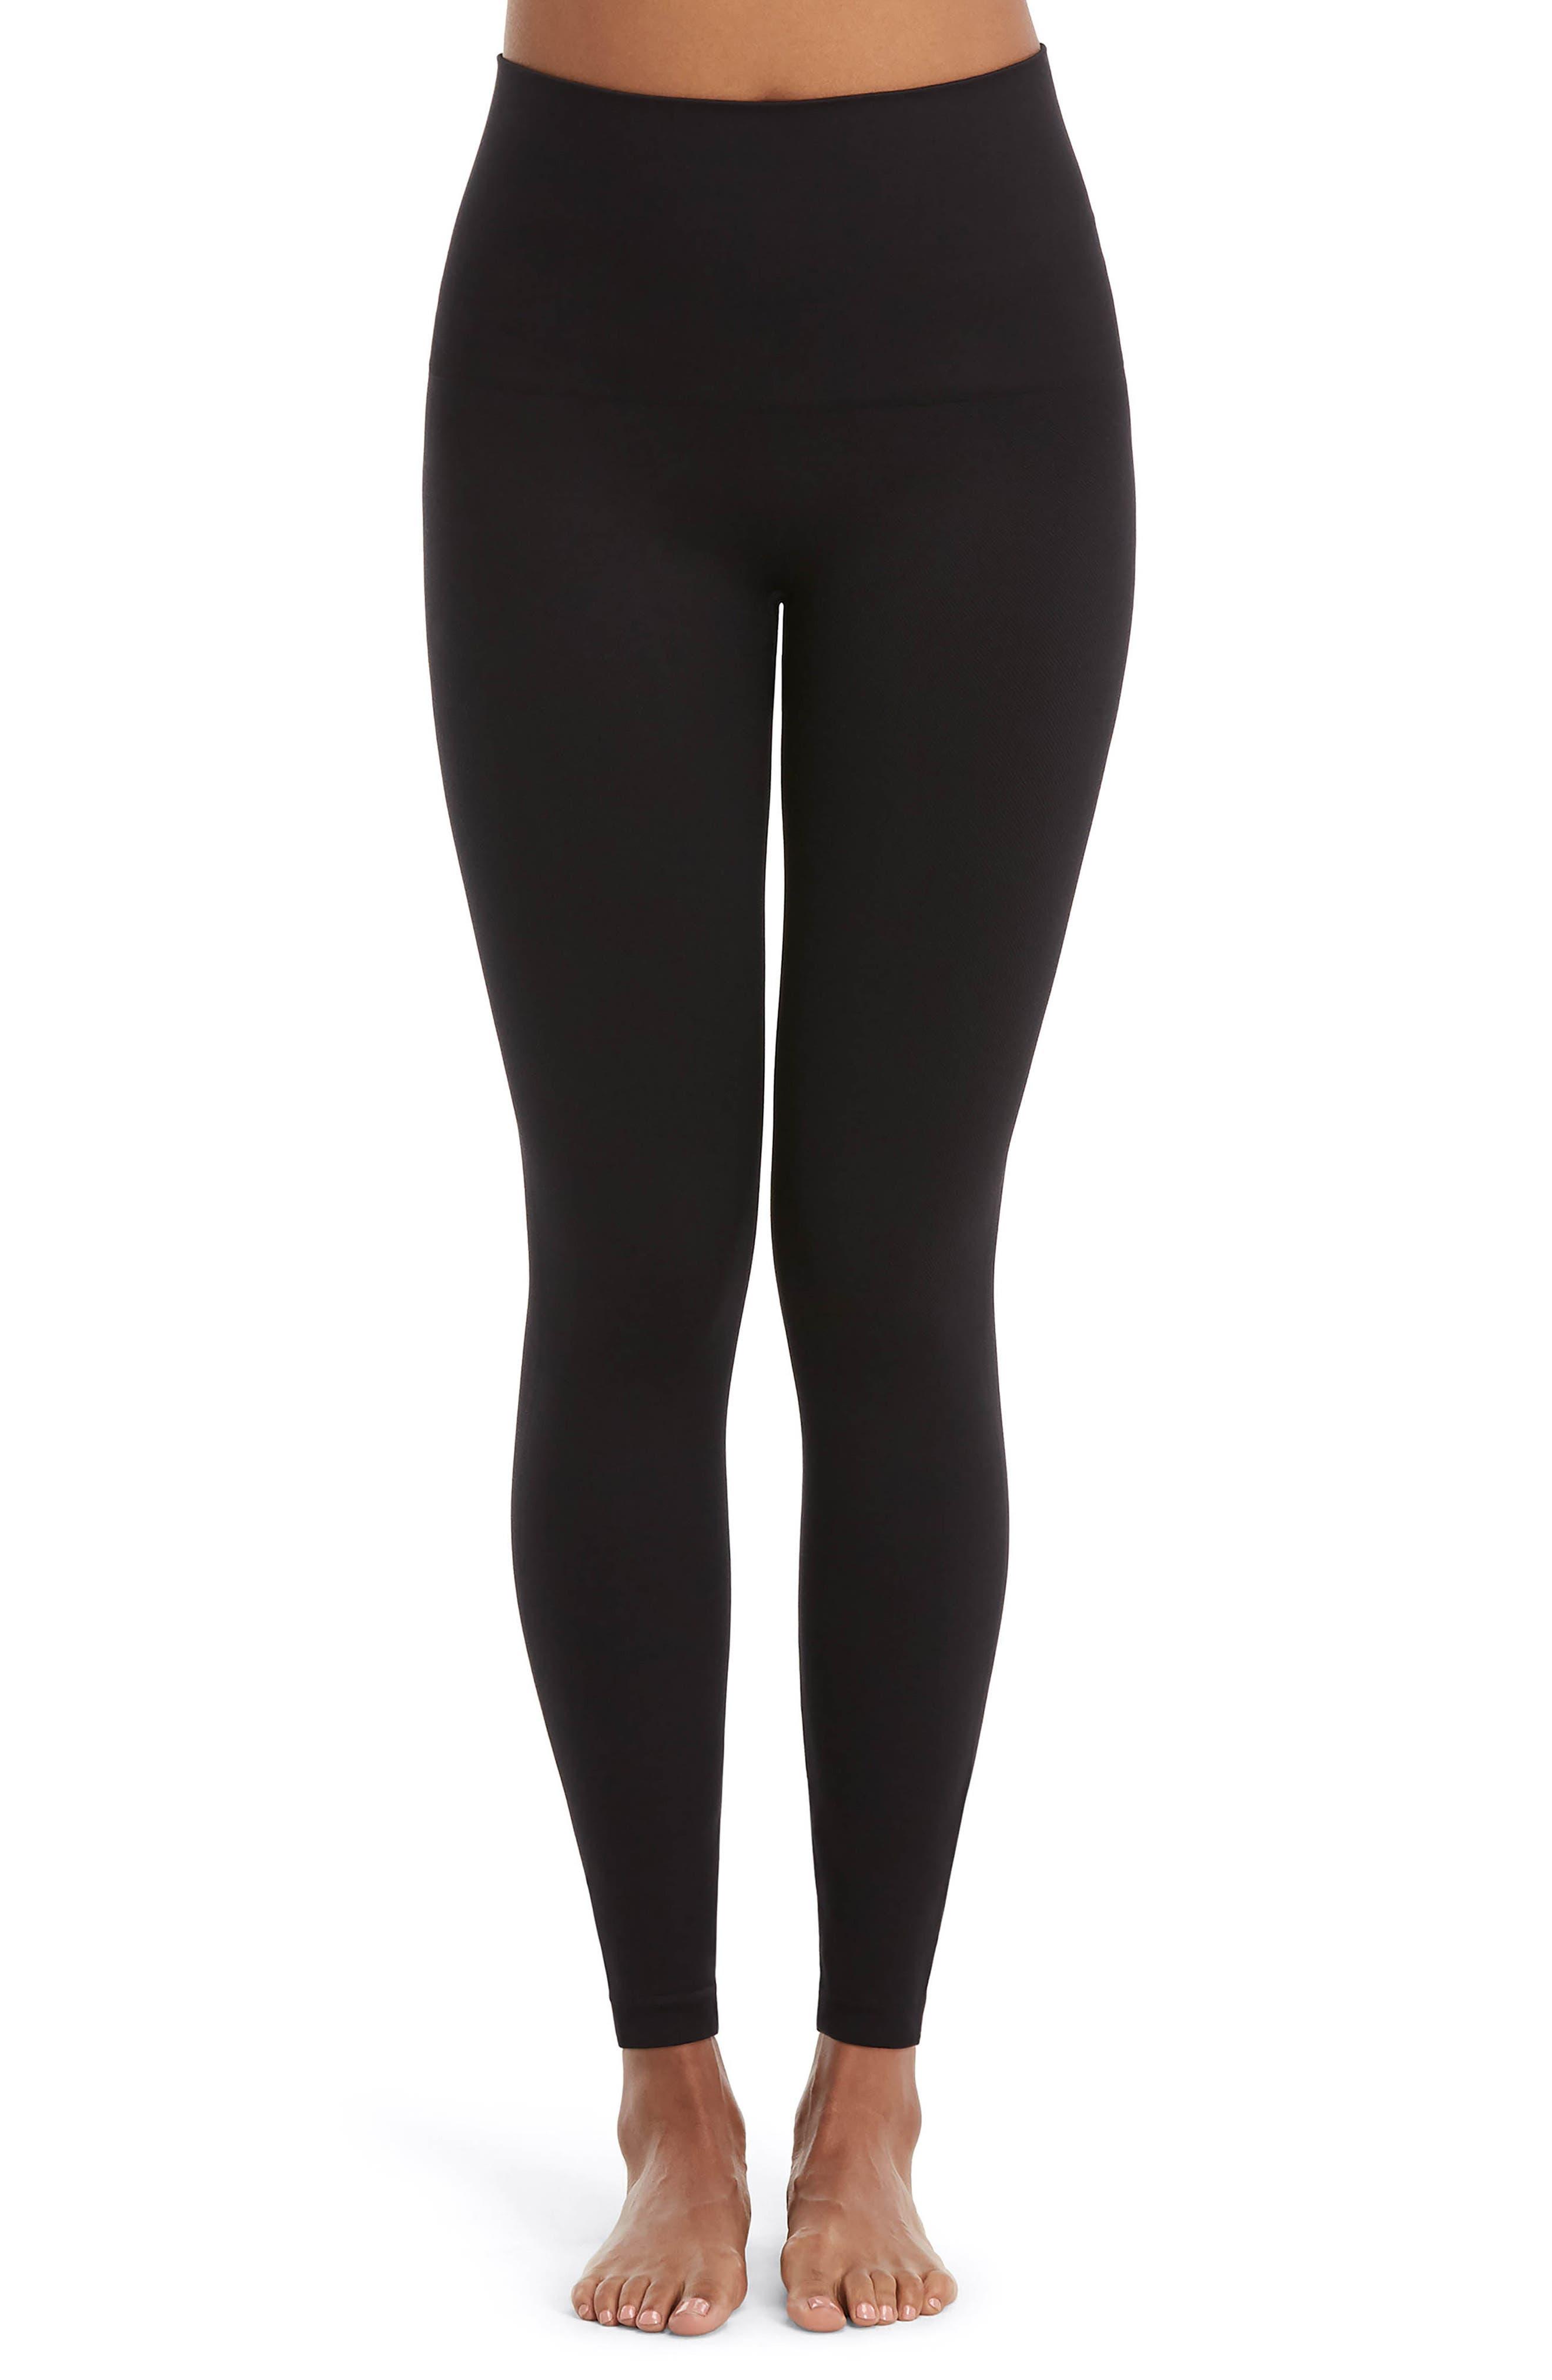 Women's Spanx Look At Me Now Seamless Leggings